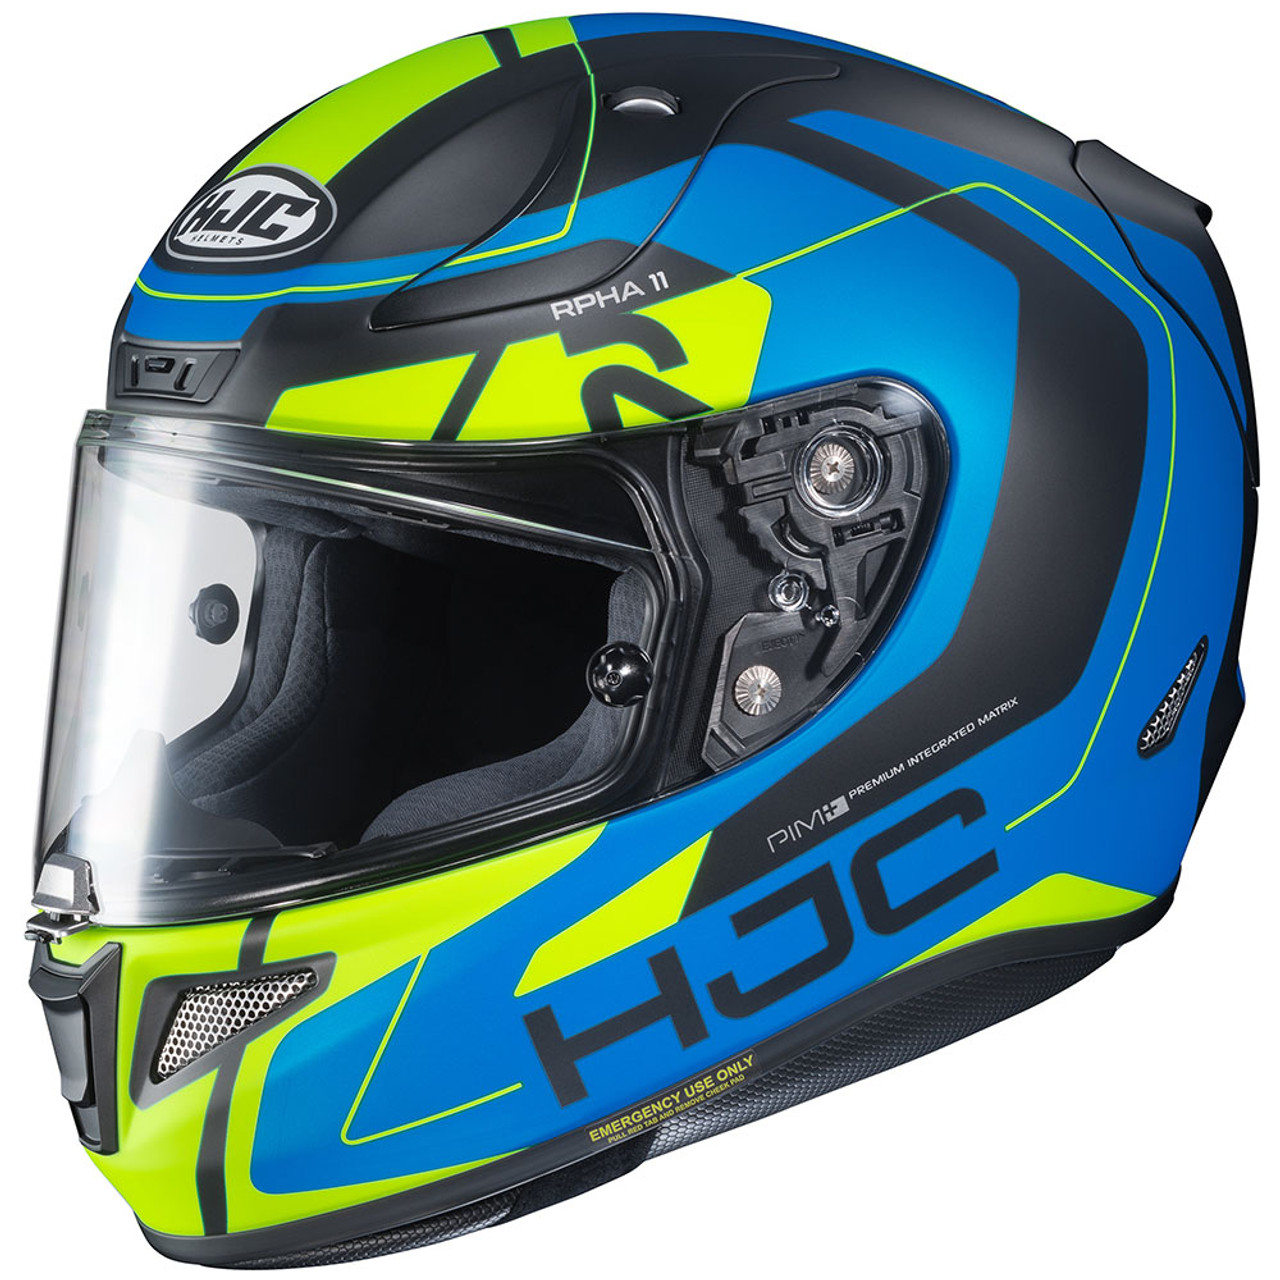 Hjc Rpha 11 >> Hjc Rpha 11 Pro Chakri Blue Yellow Helmet Get Lowered Cycles